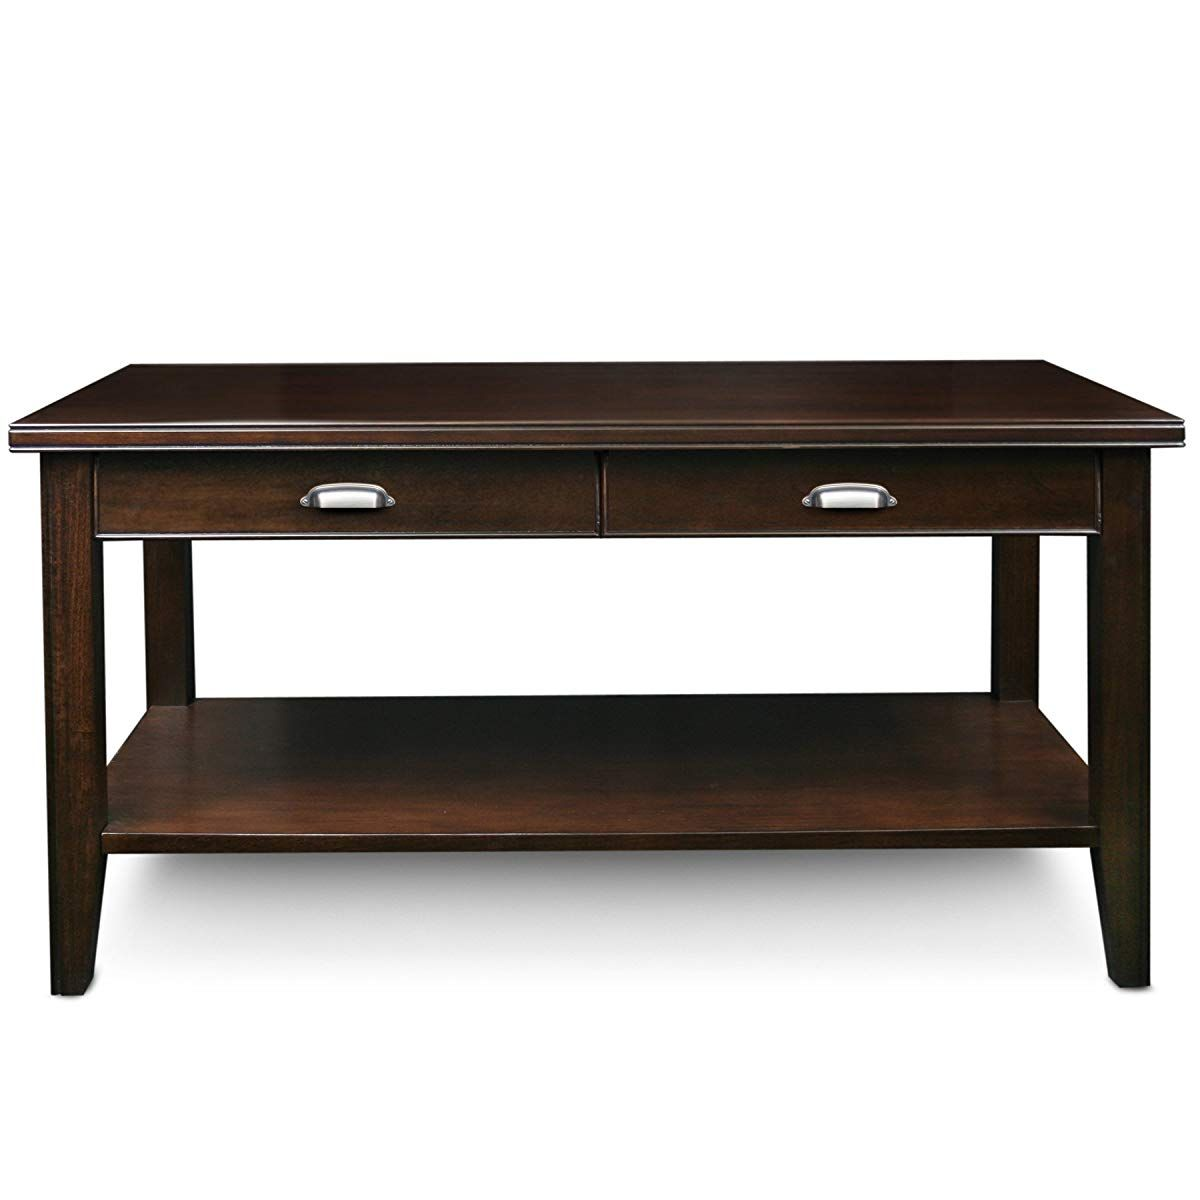 "62519c8981b89 HOMCOM 39"" Modern Lift Top Coffee Table Desk With Hidden Storage - Light  Grey Woodgrain"